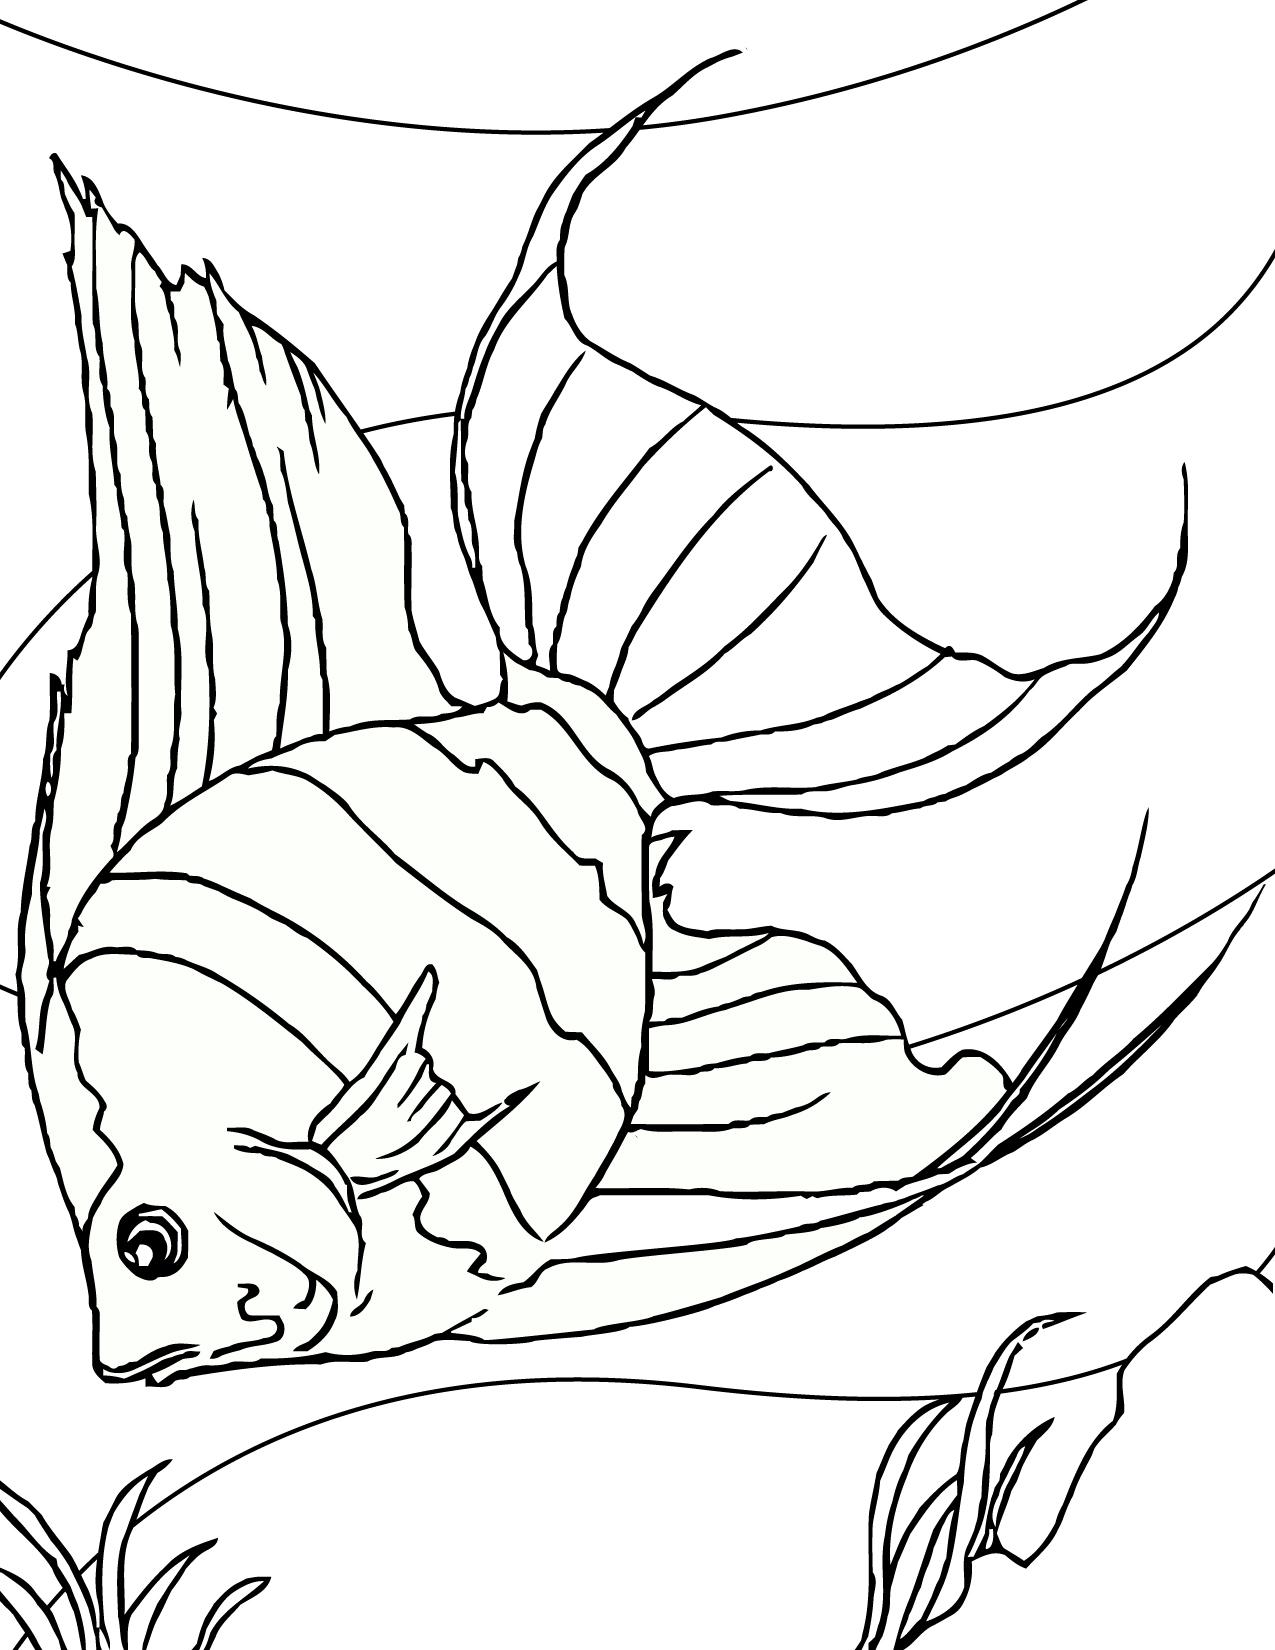 Go Fish! | Fish crafts preschool, Fish coloring page, Fish template | 1650x1275